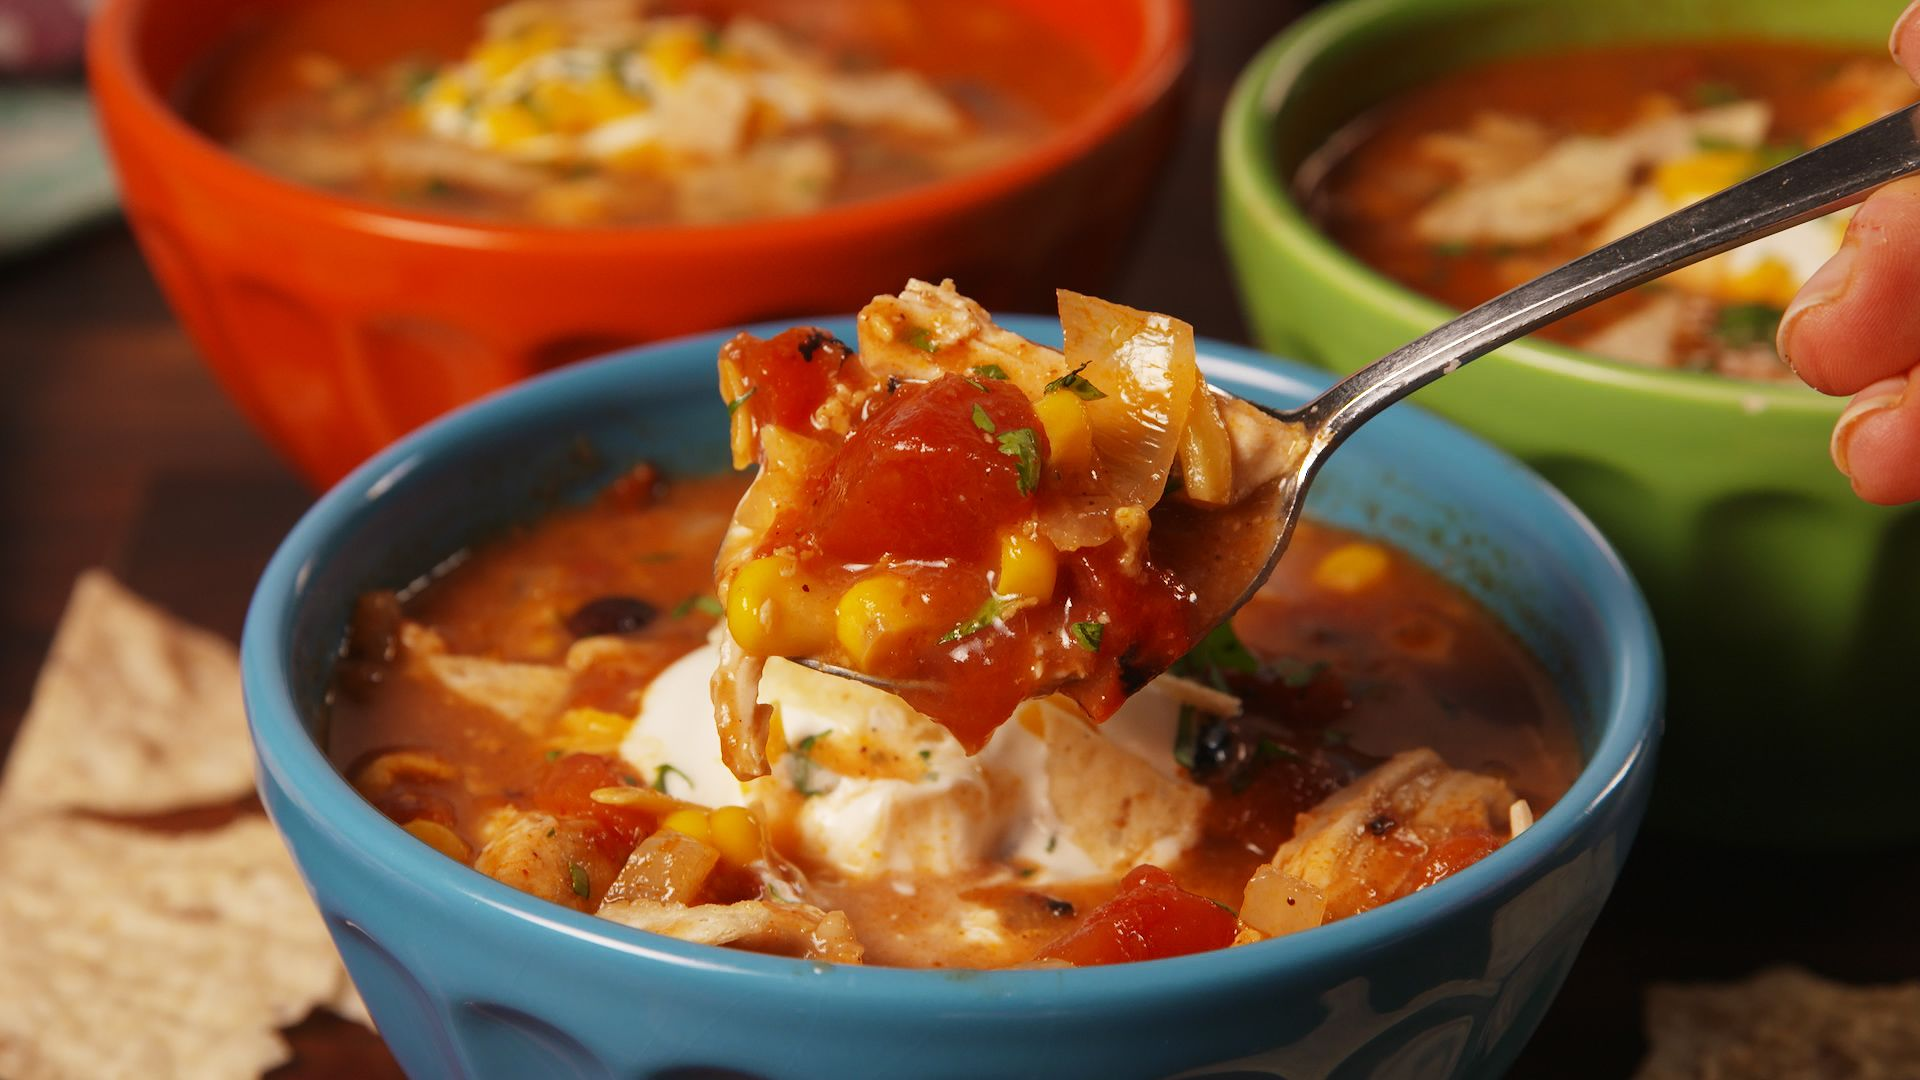 Best Crock Pot Chicken Enchilada Soup Recipe How To Make Crock Pot